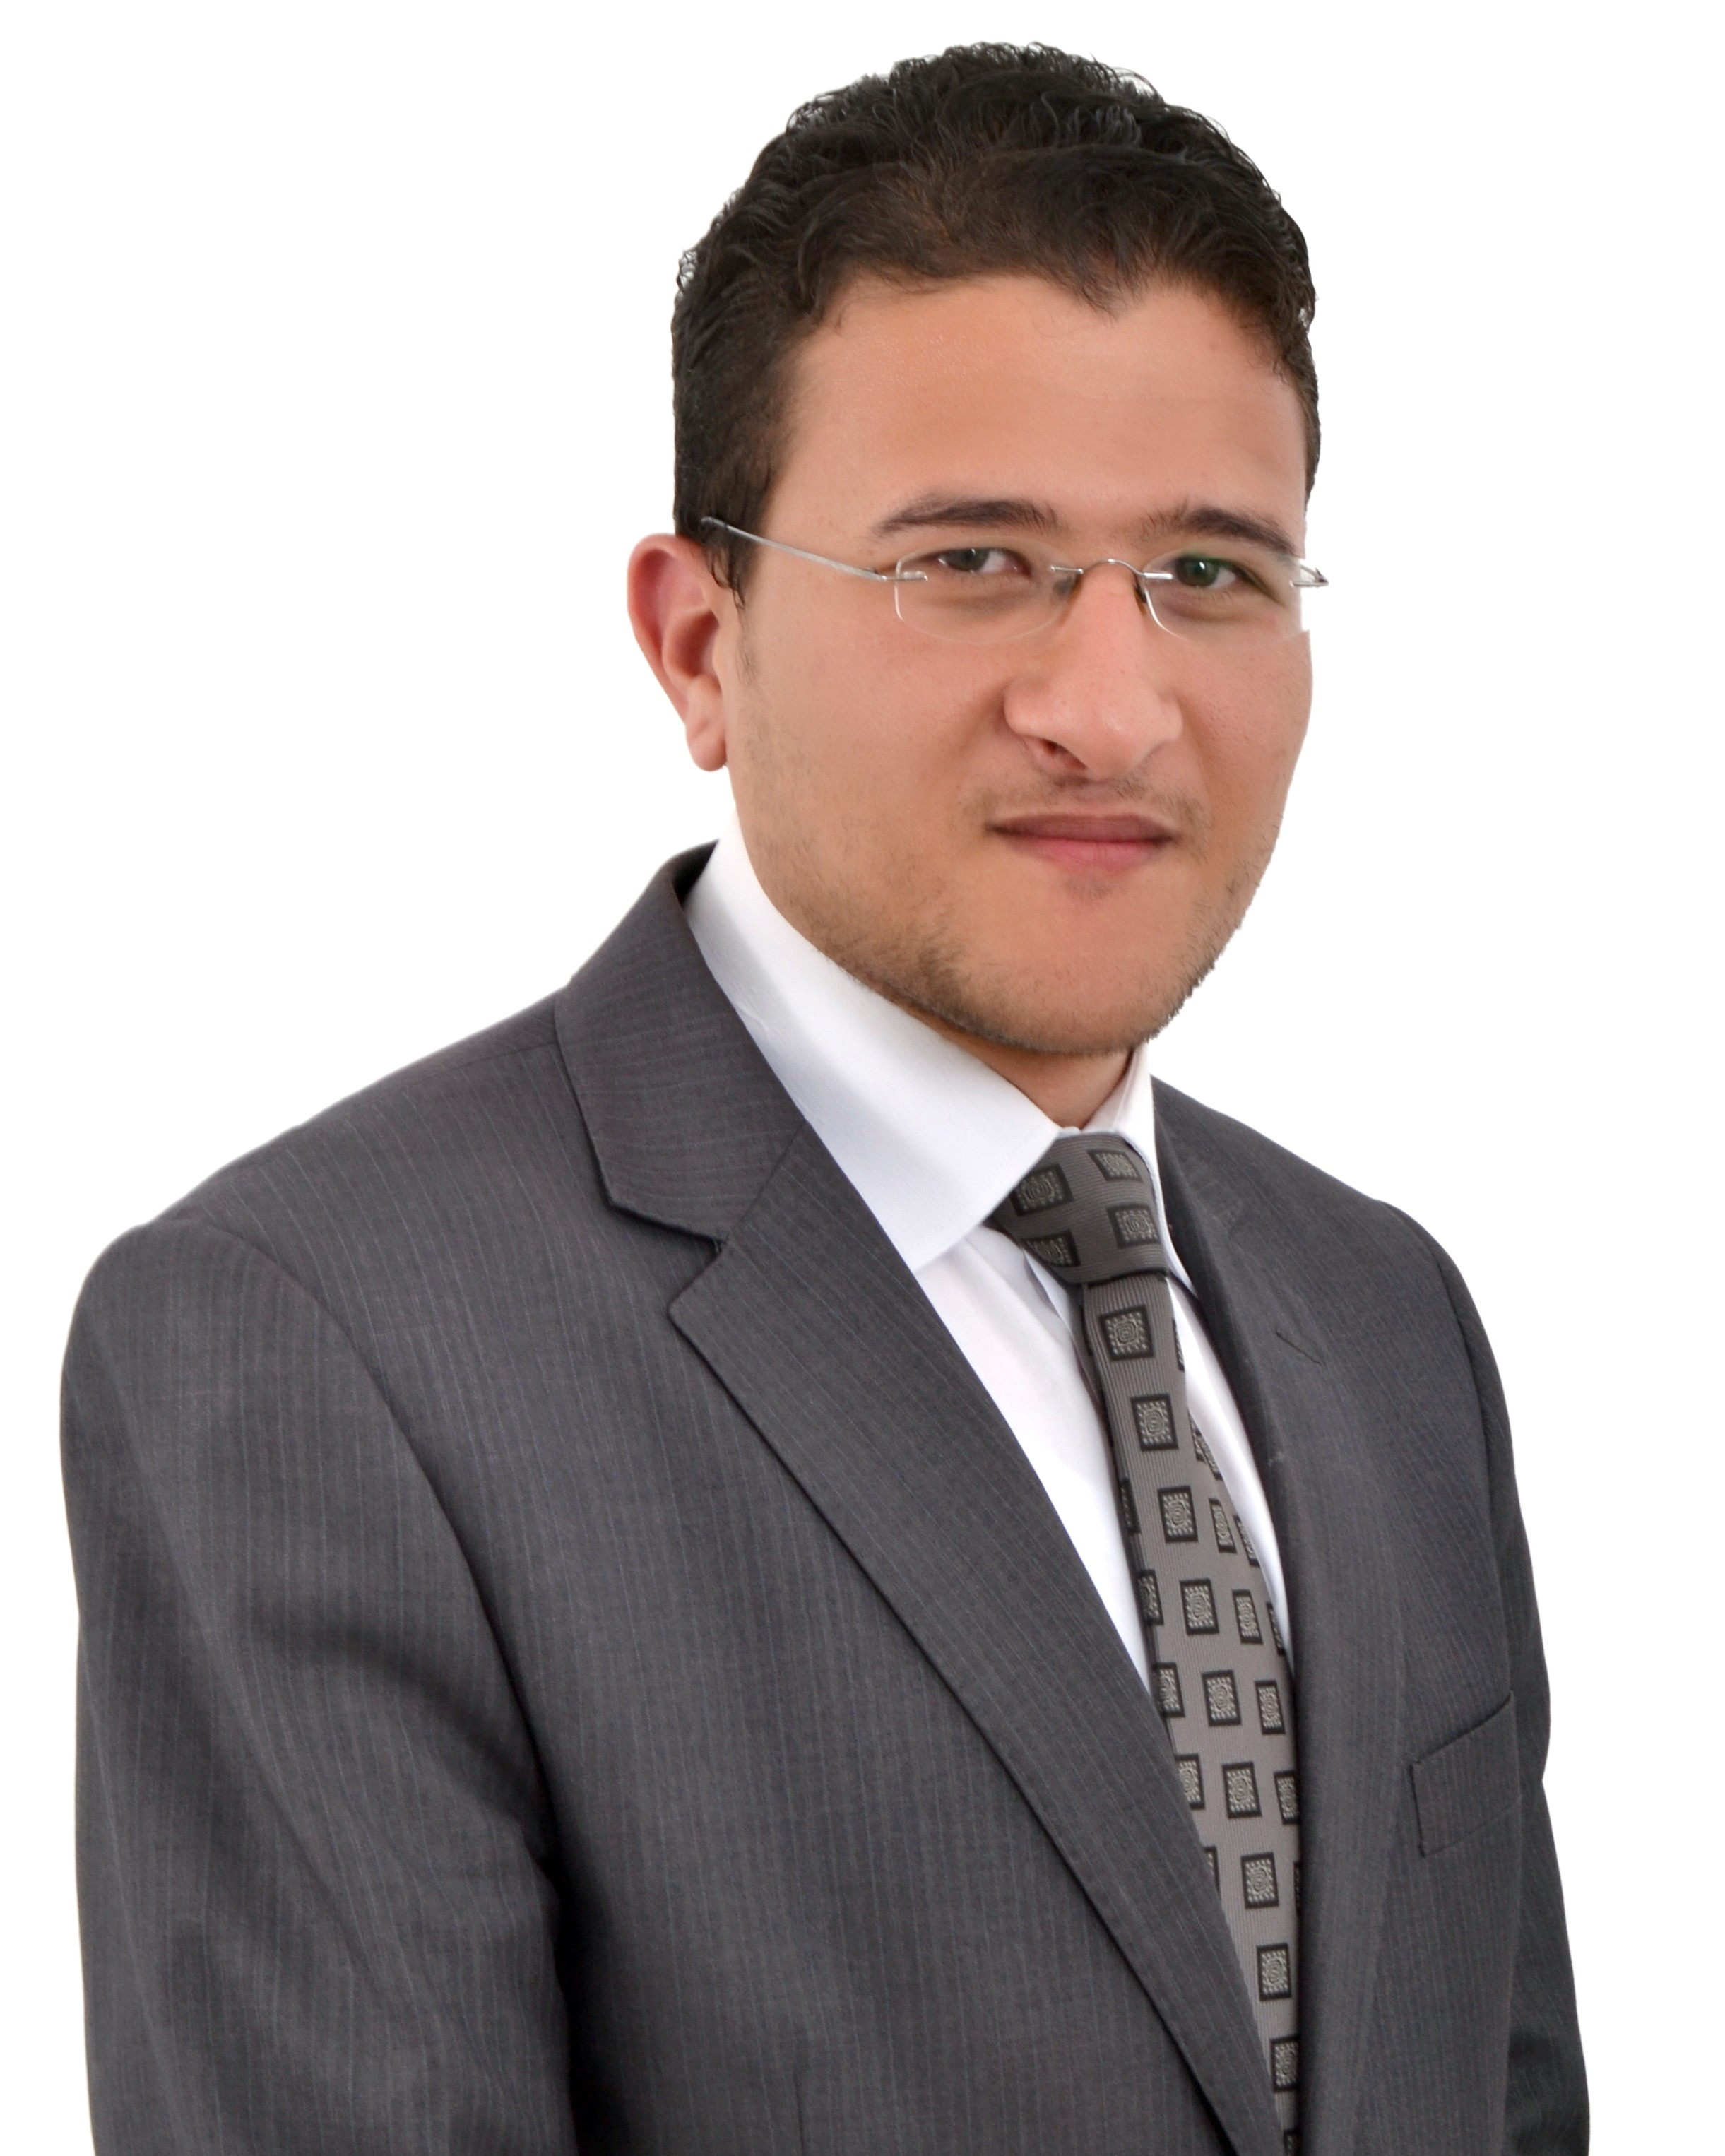 Yahia Salama